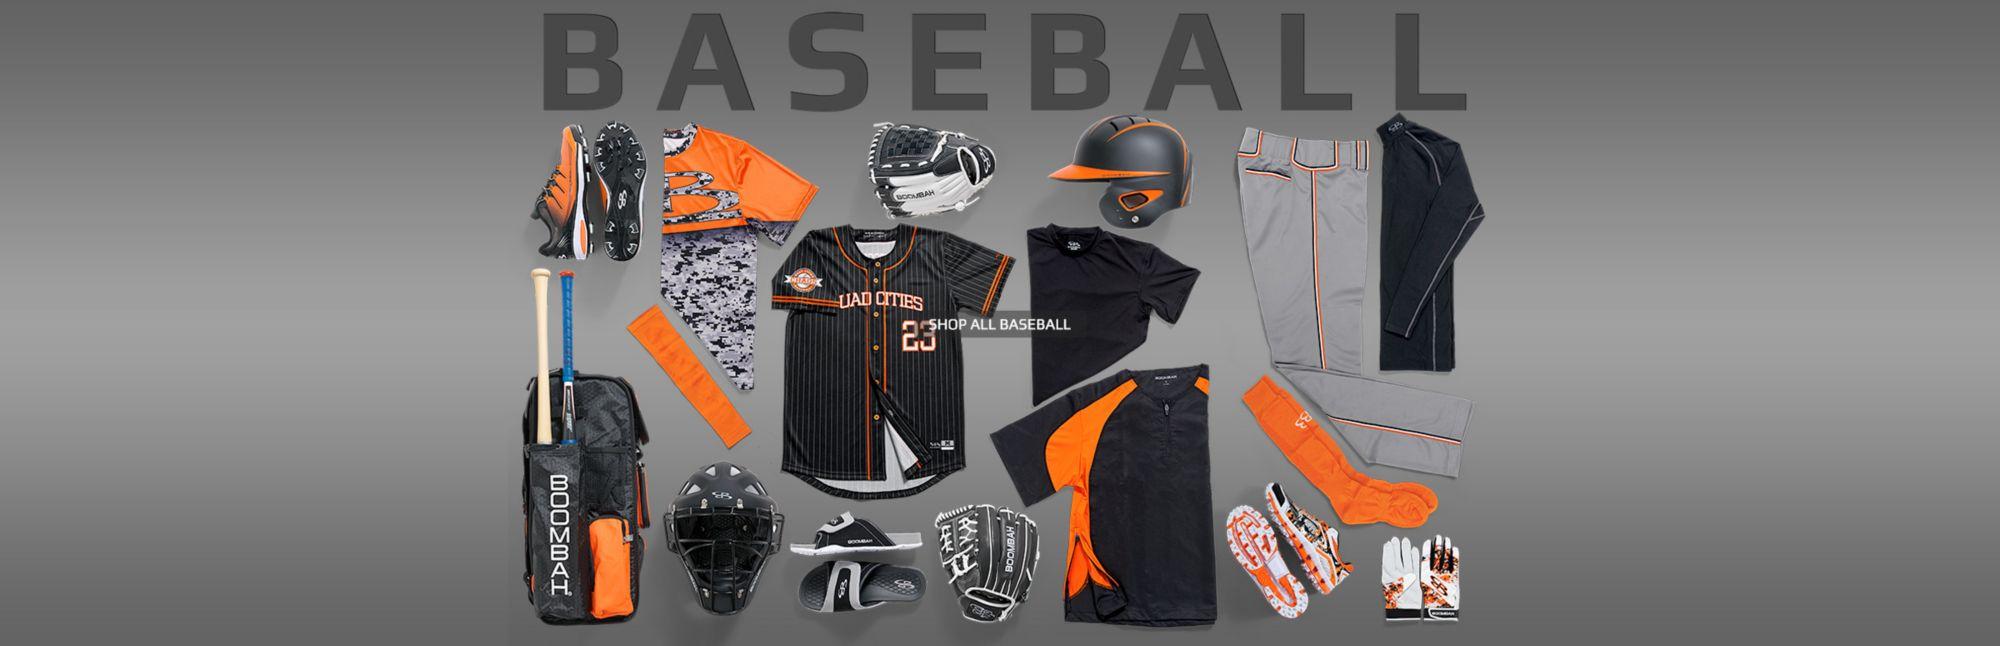 Shop all Baseball Items